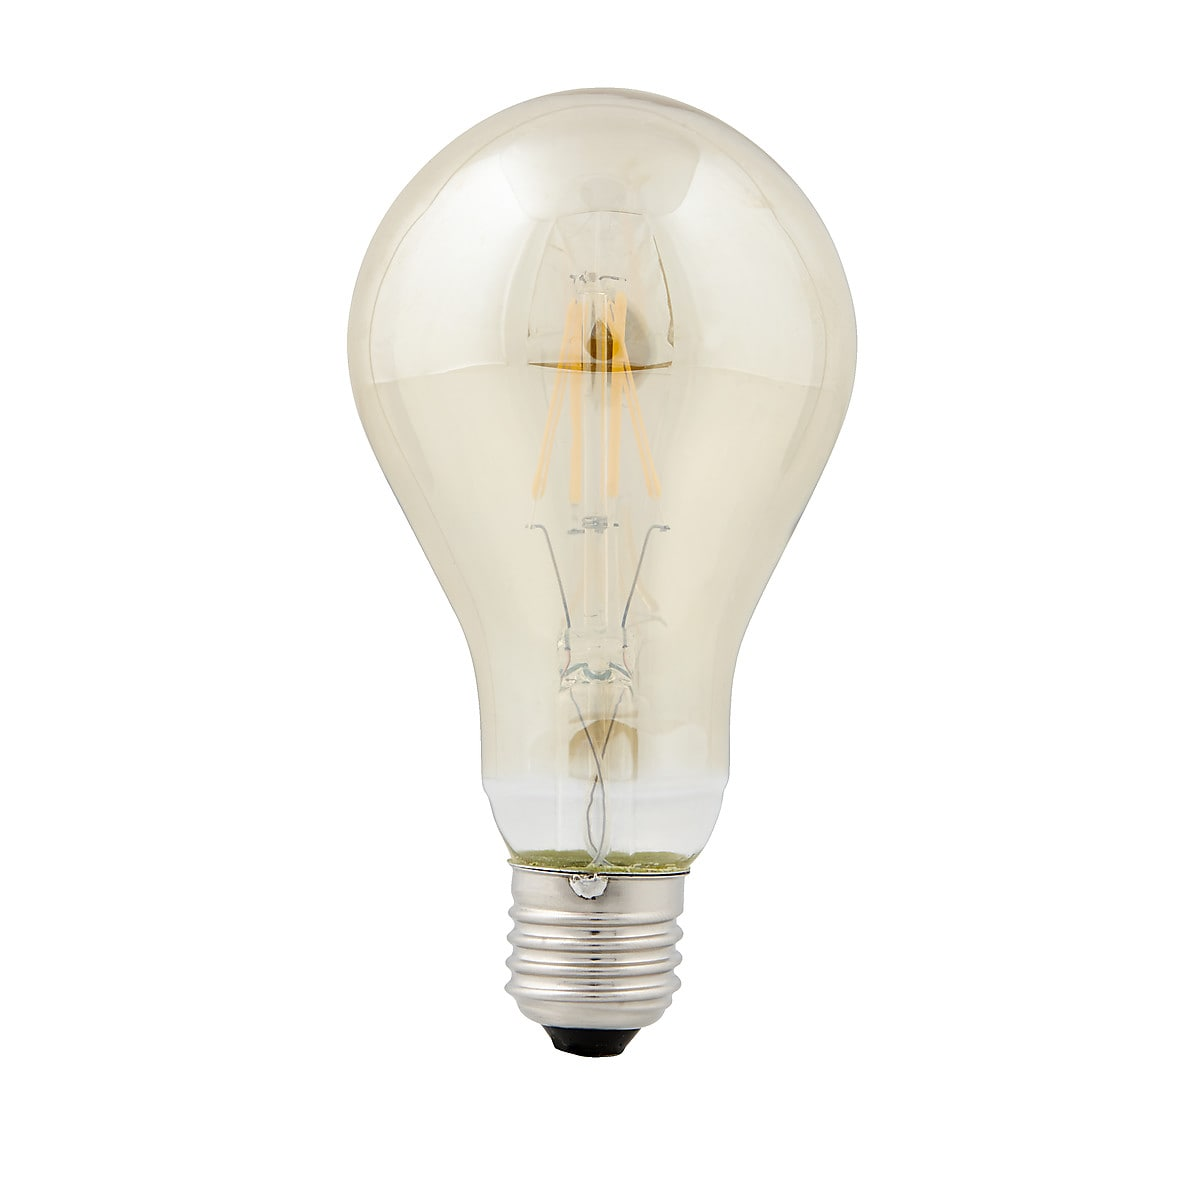 Dimringsbar dekorationslampa LED Normal E27